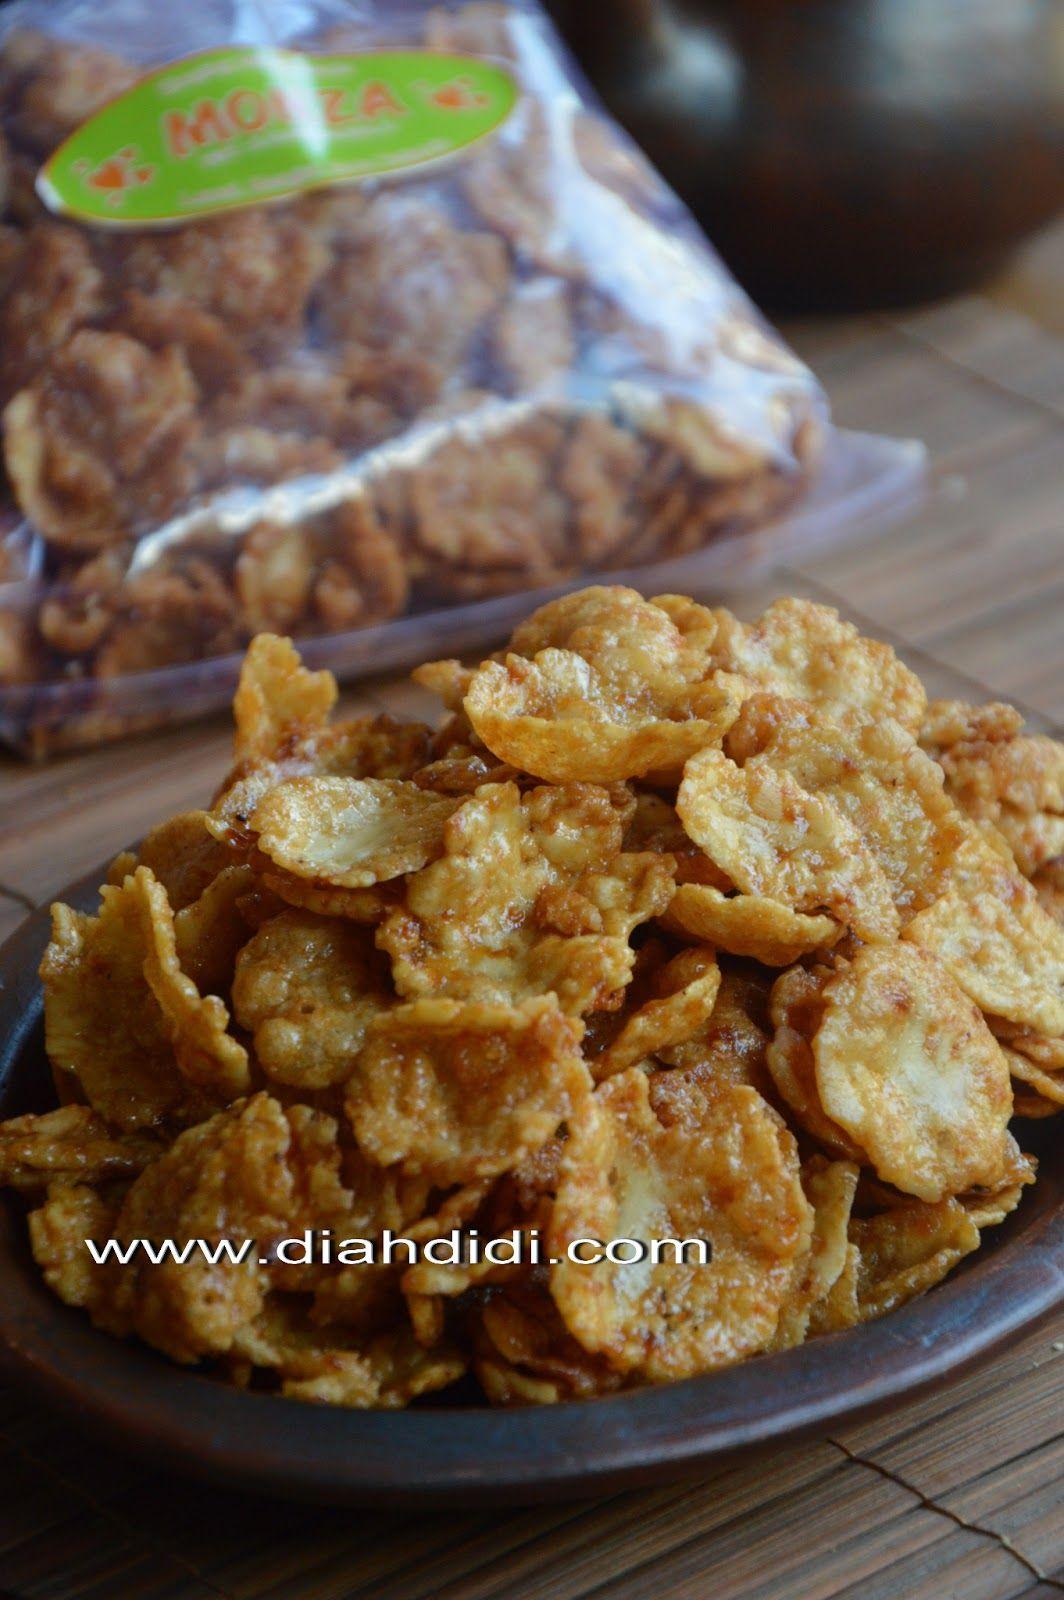 Diah Didi S Kitchen Emping Melinjo Klatak Resep Masakan Indonesia Makanan Indonesia Makanan